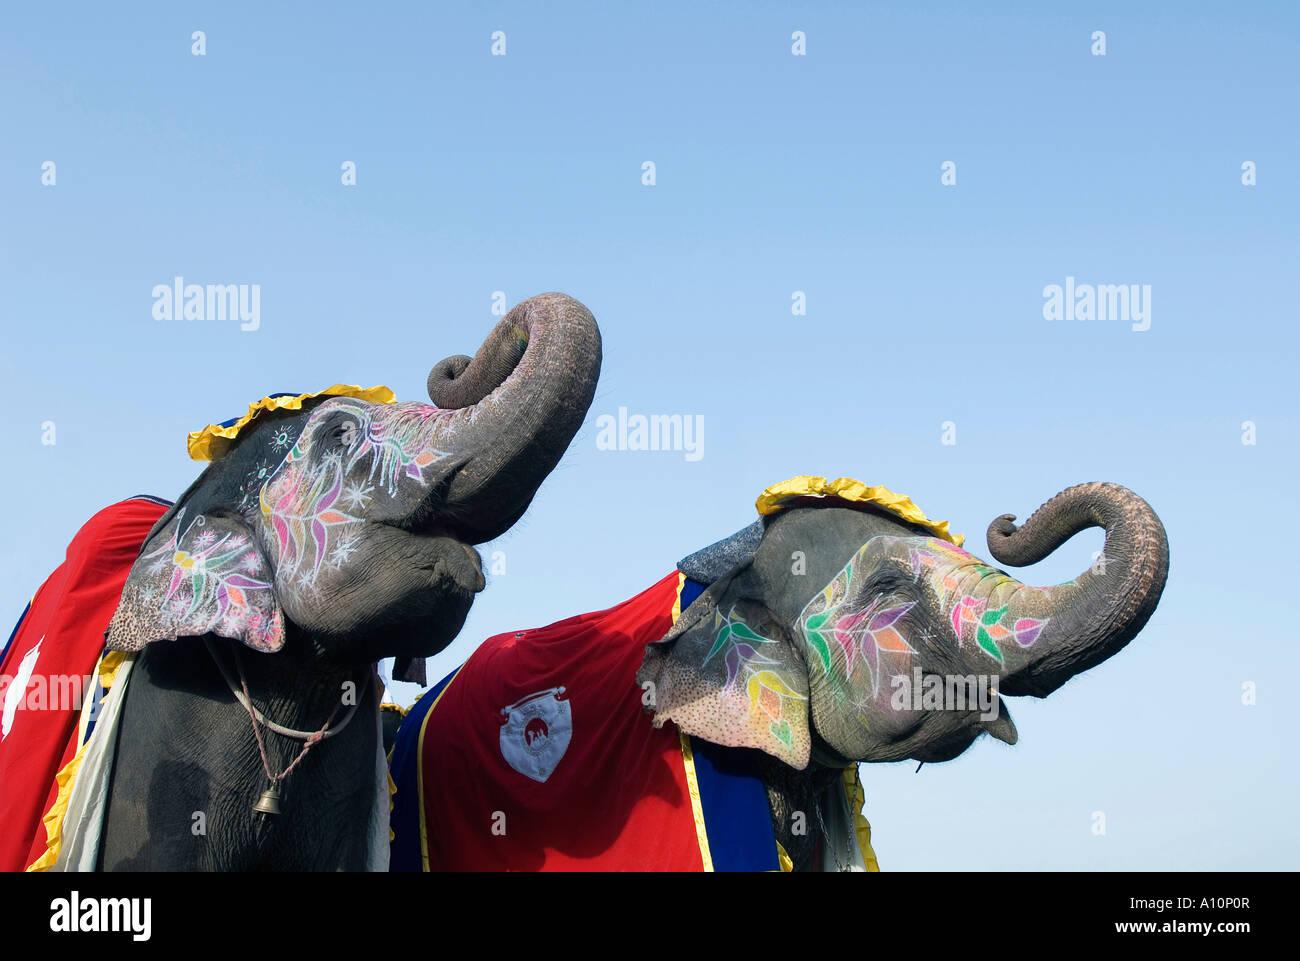 Basso angolo vista del dipinto di elefanti soffiando le trombe, Jaipur, Rajasthan, India Immagini Stock